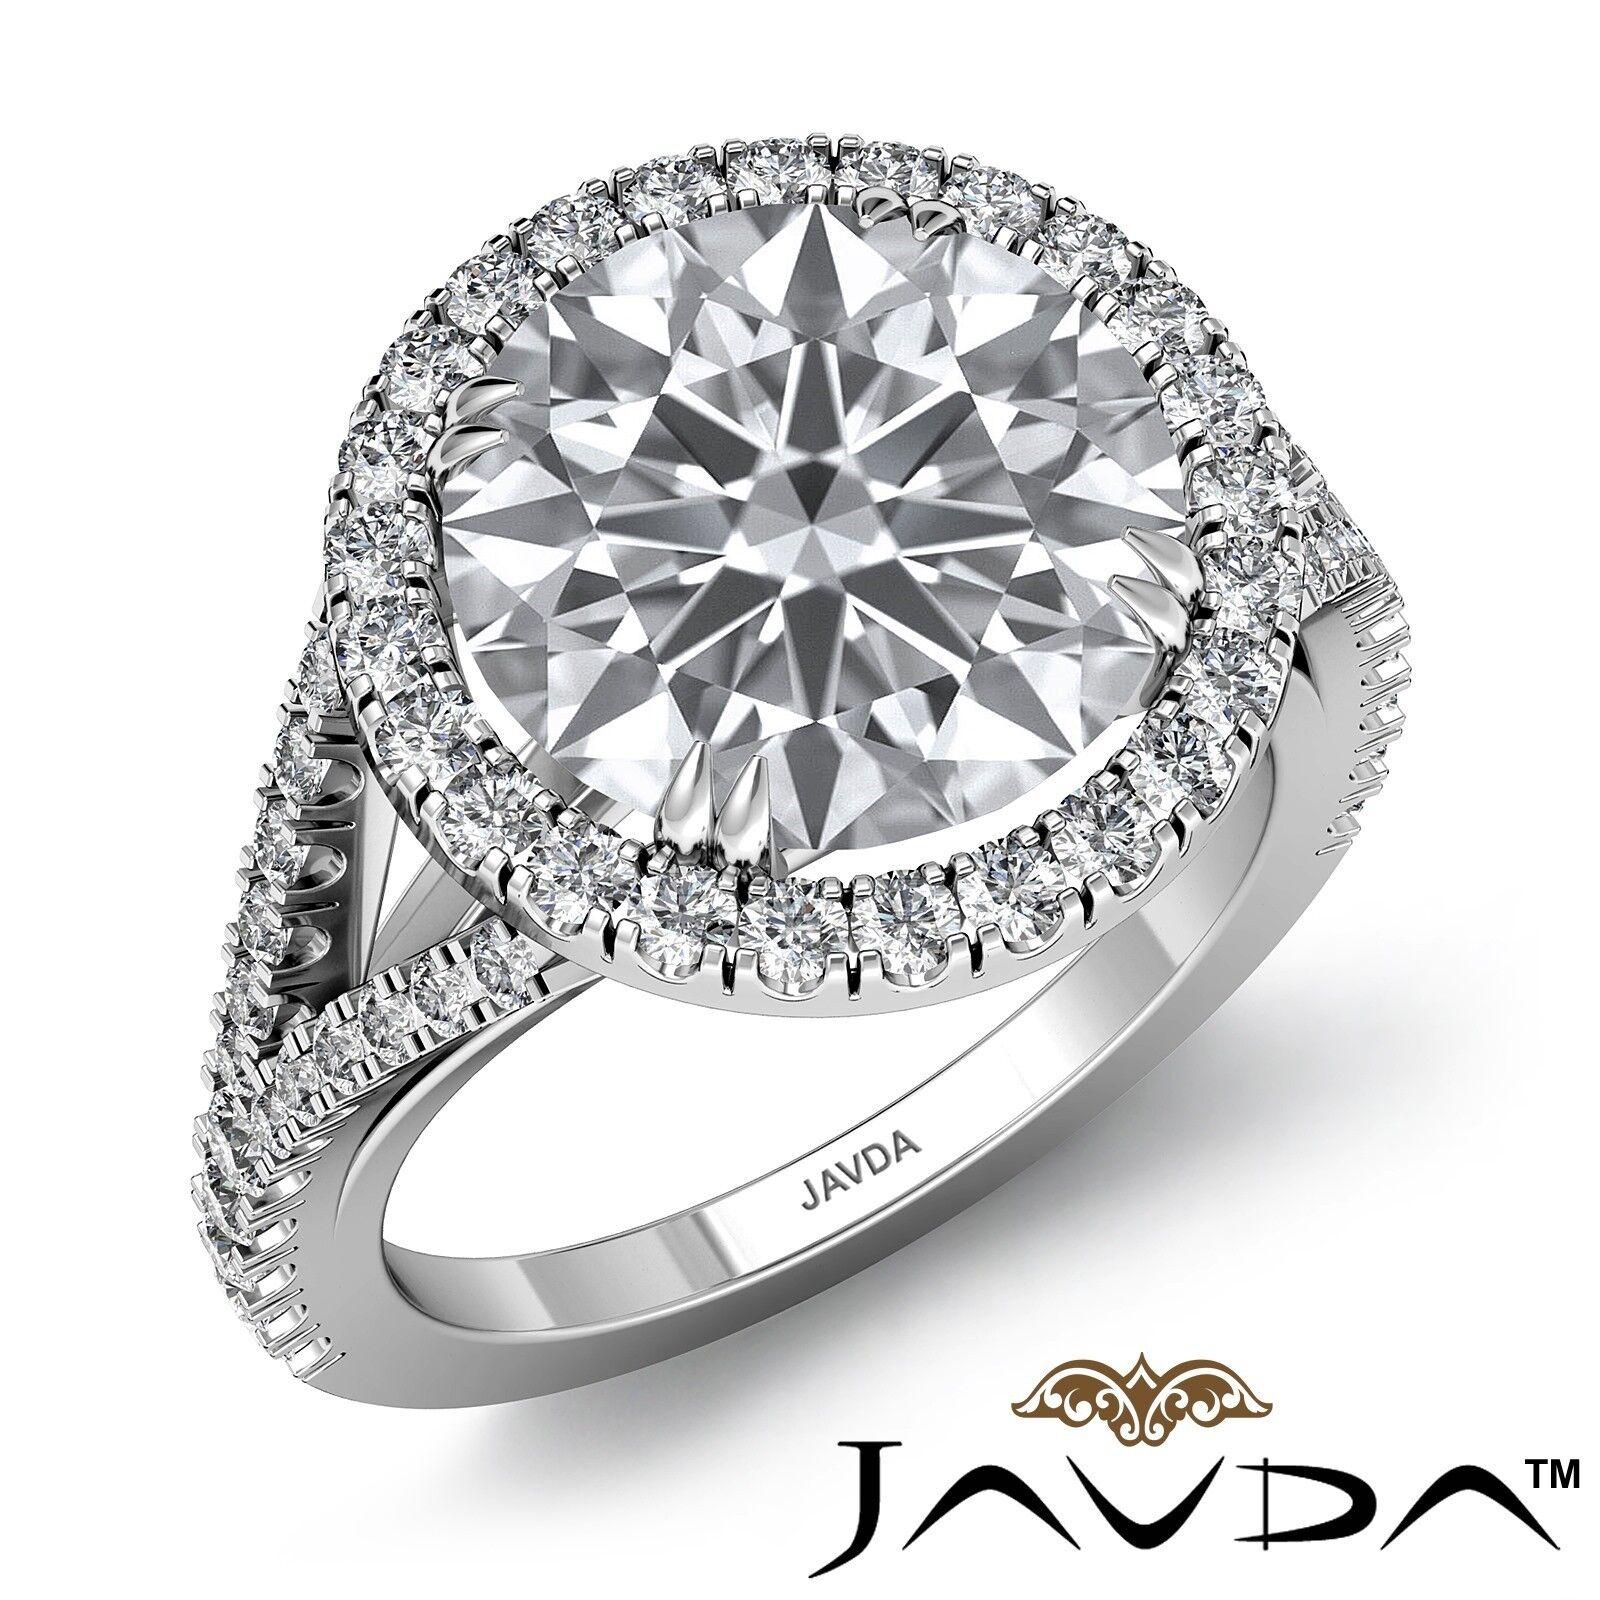 3.95ctw Halo Pave Set Round Diamond Engagement Ring GIA I-VVS2 Platinum Women